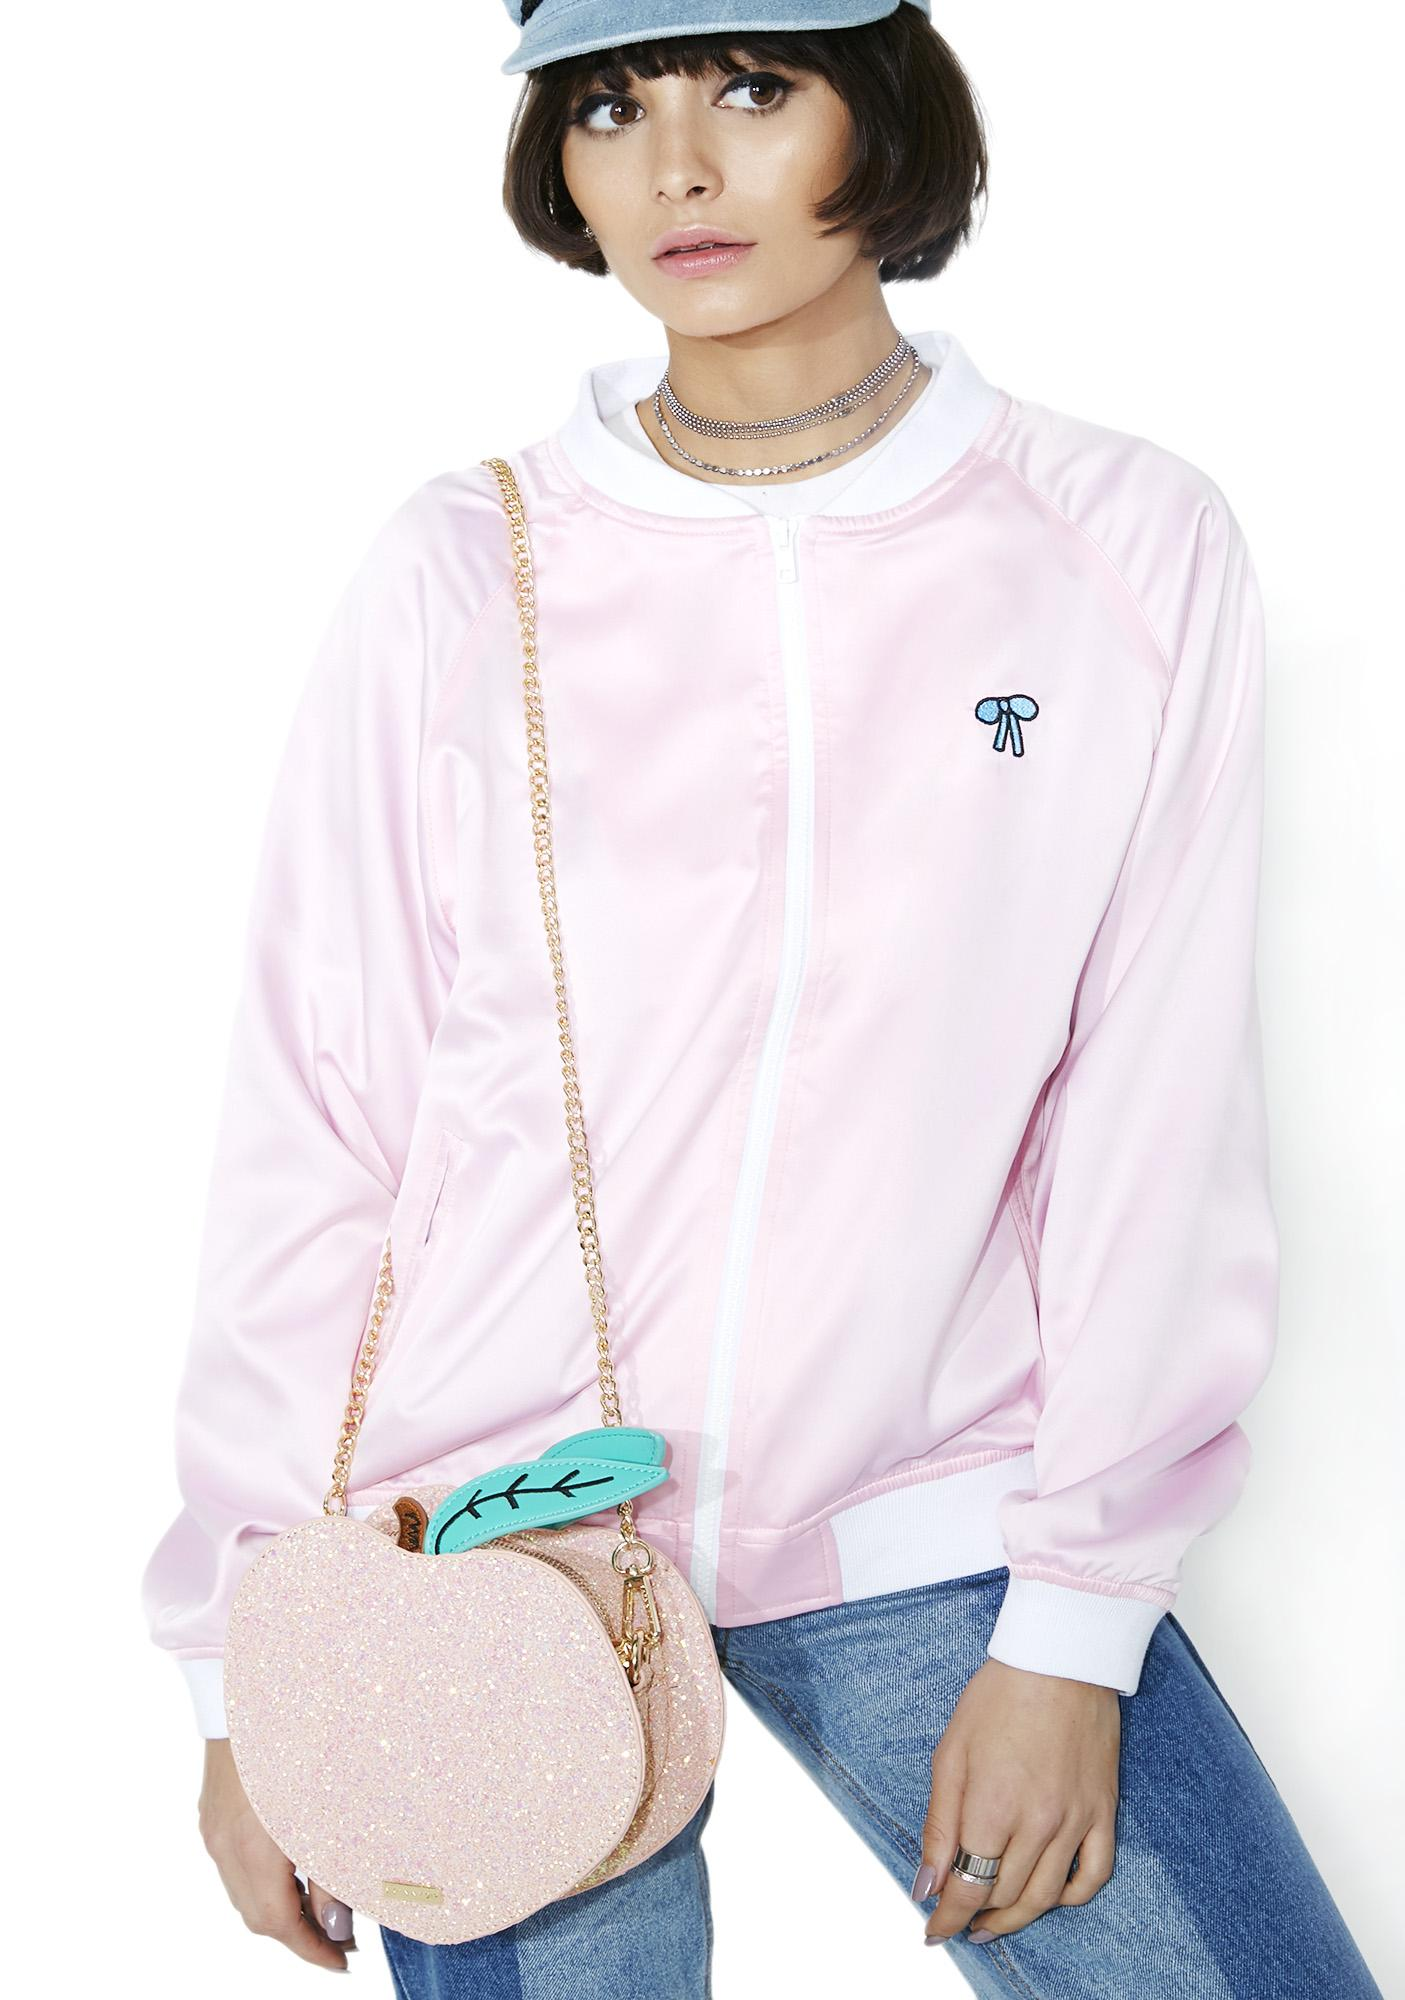 Skinnydip Peachy Crossbody Bag